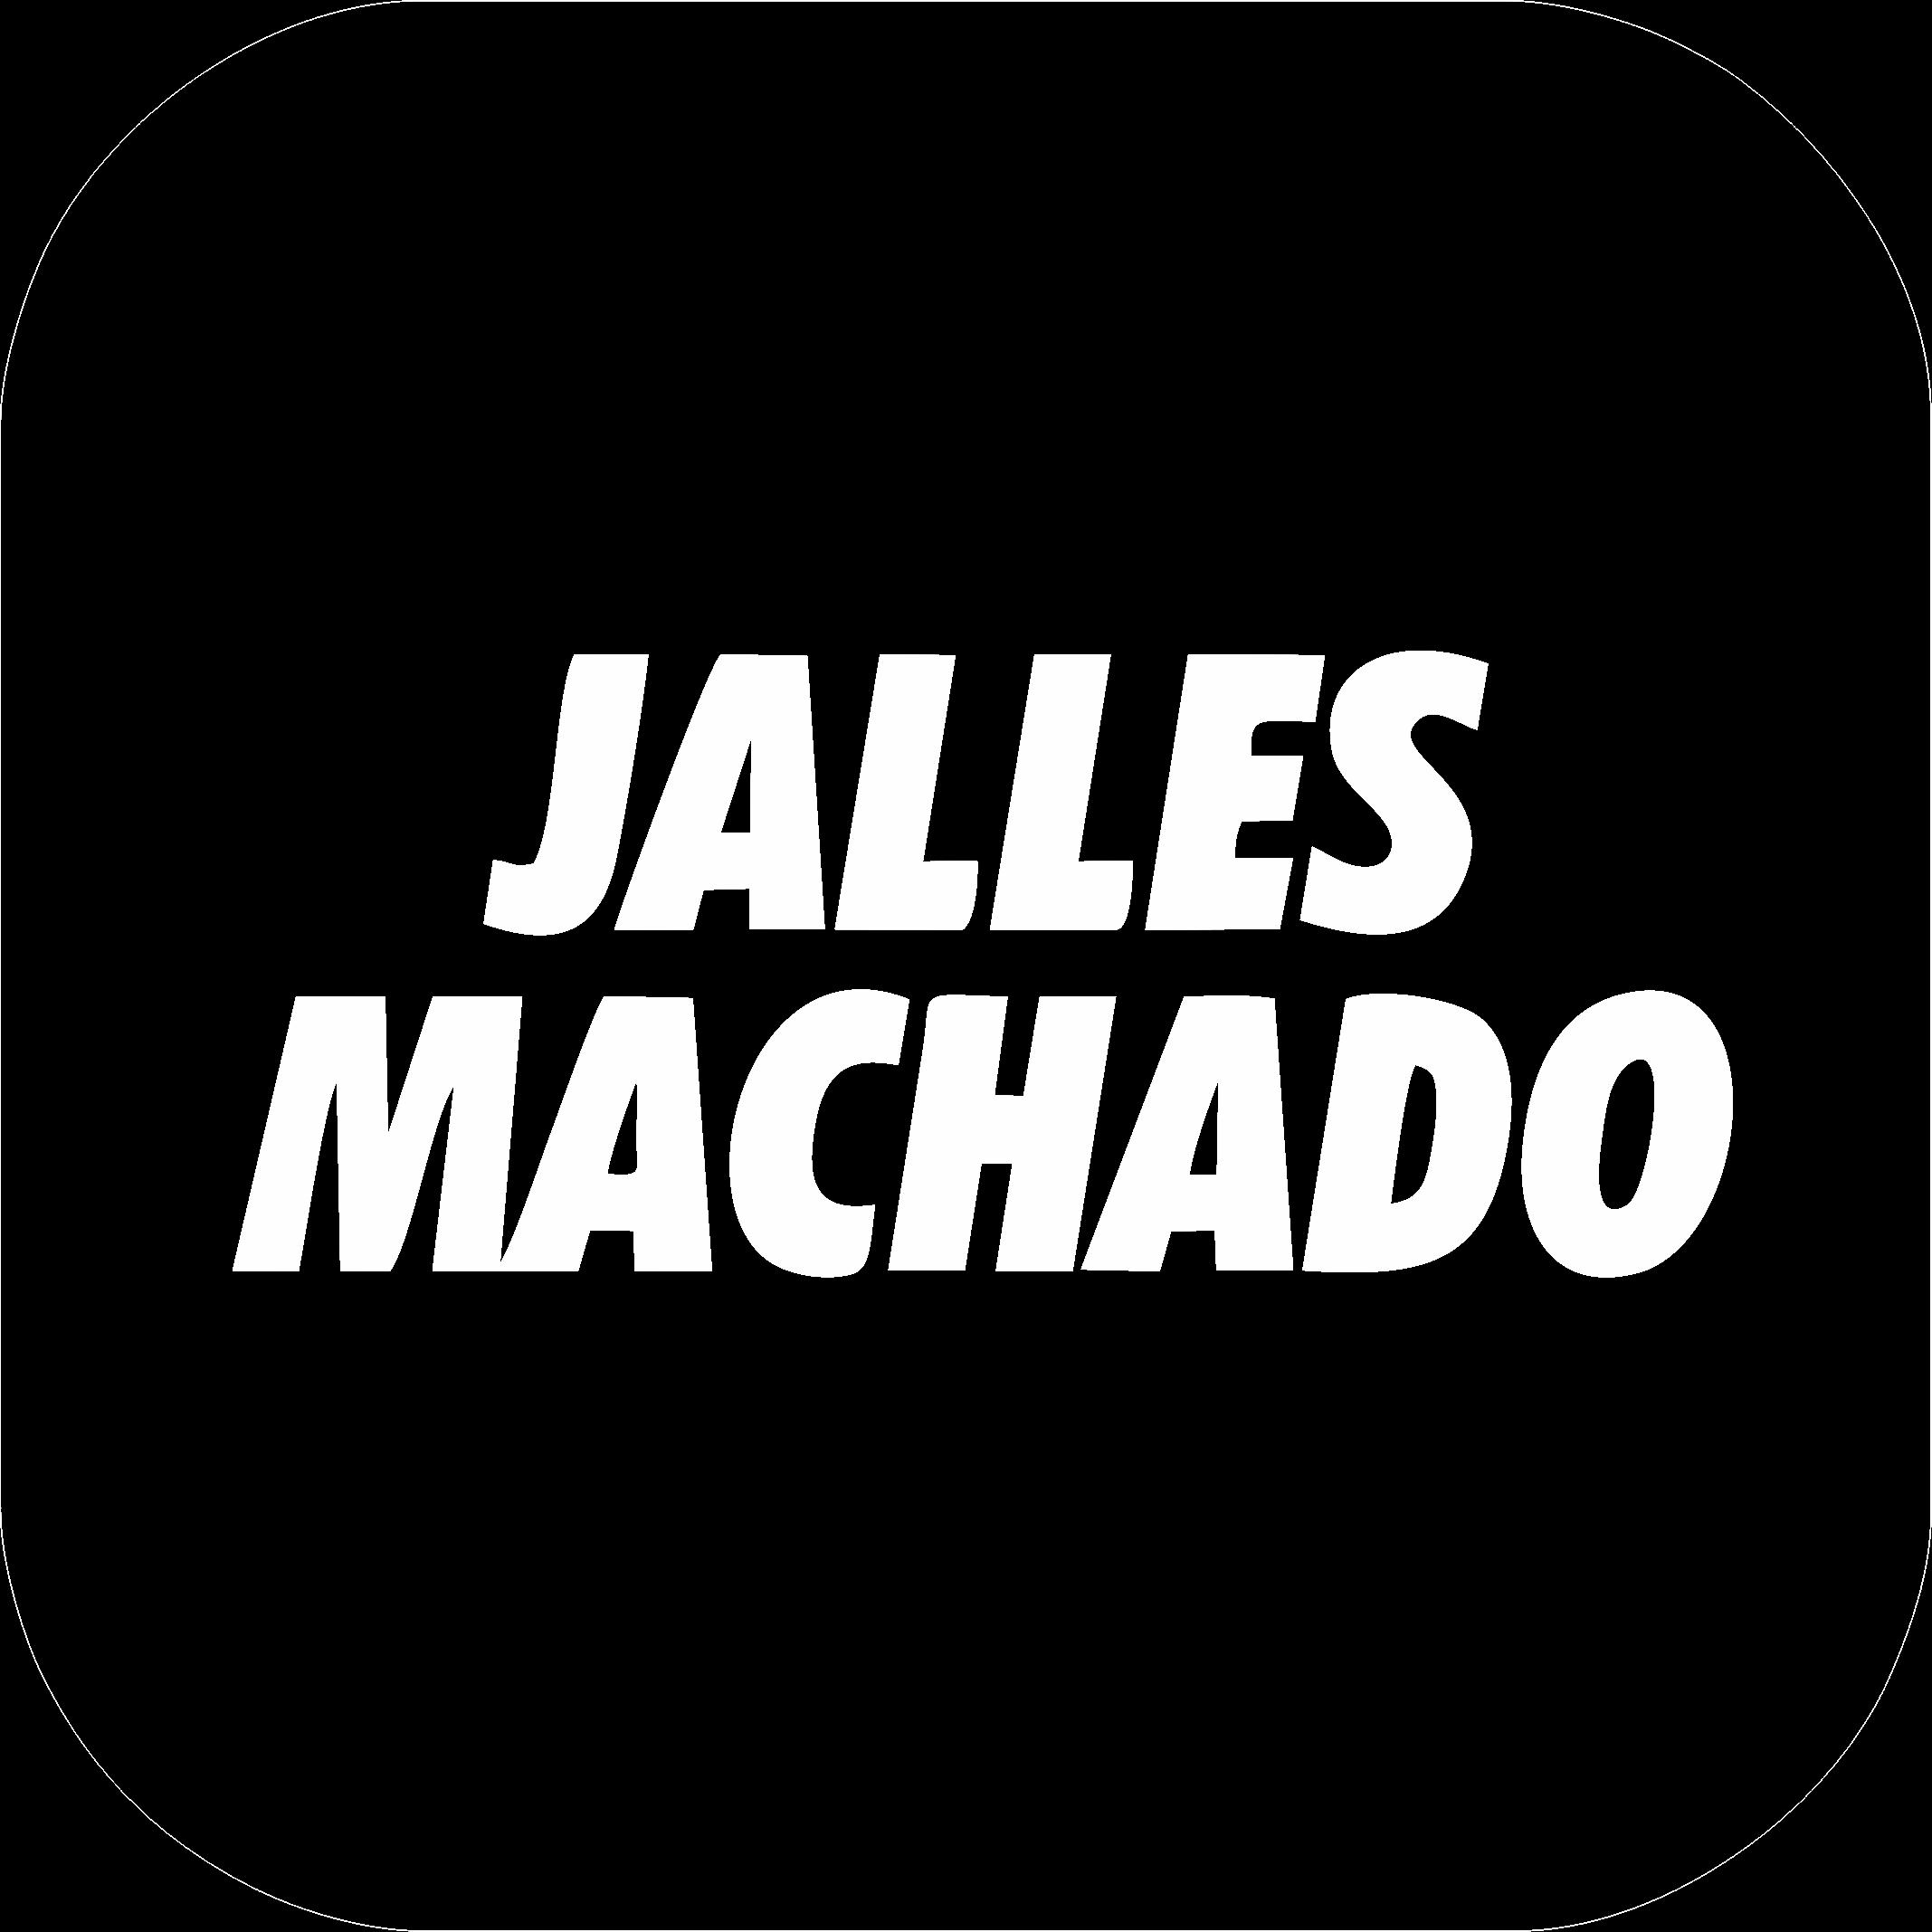 jalles-machado